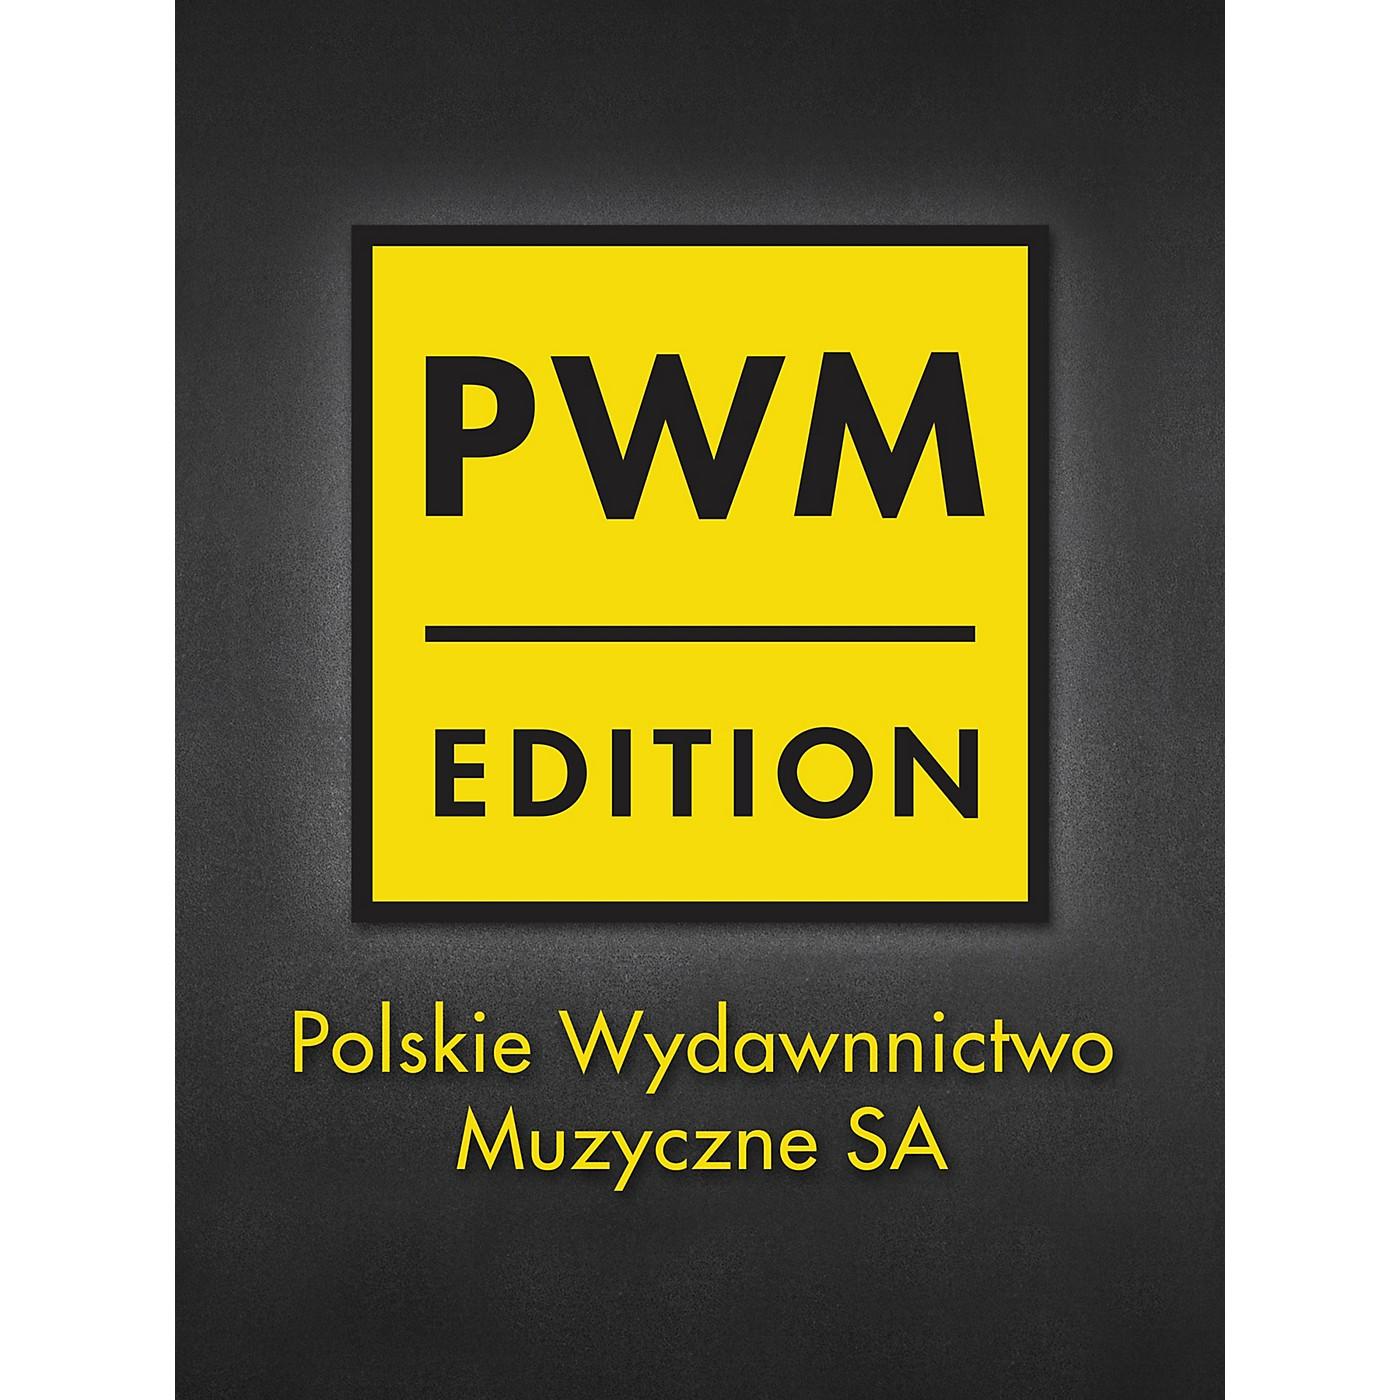 PWM Magnificat For Soprano, Tenor, Baritone, Mixed Choir And Orchestra - Score PWM Series by W Kilar thumbnail